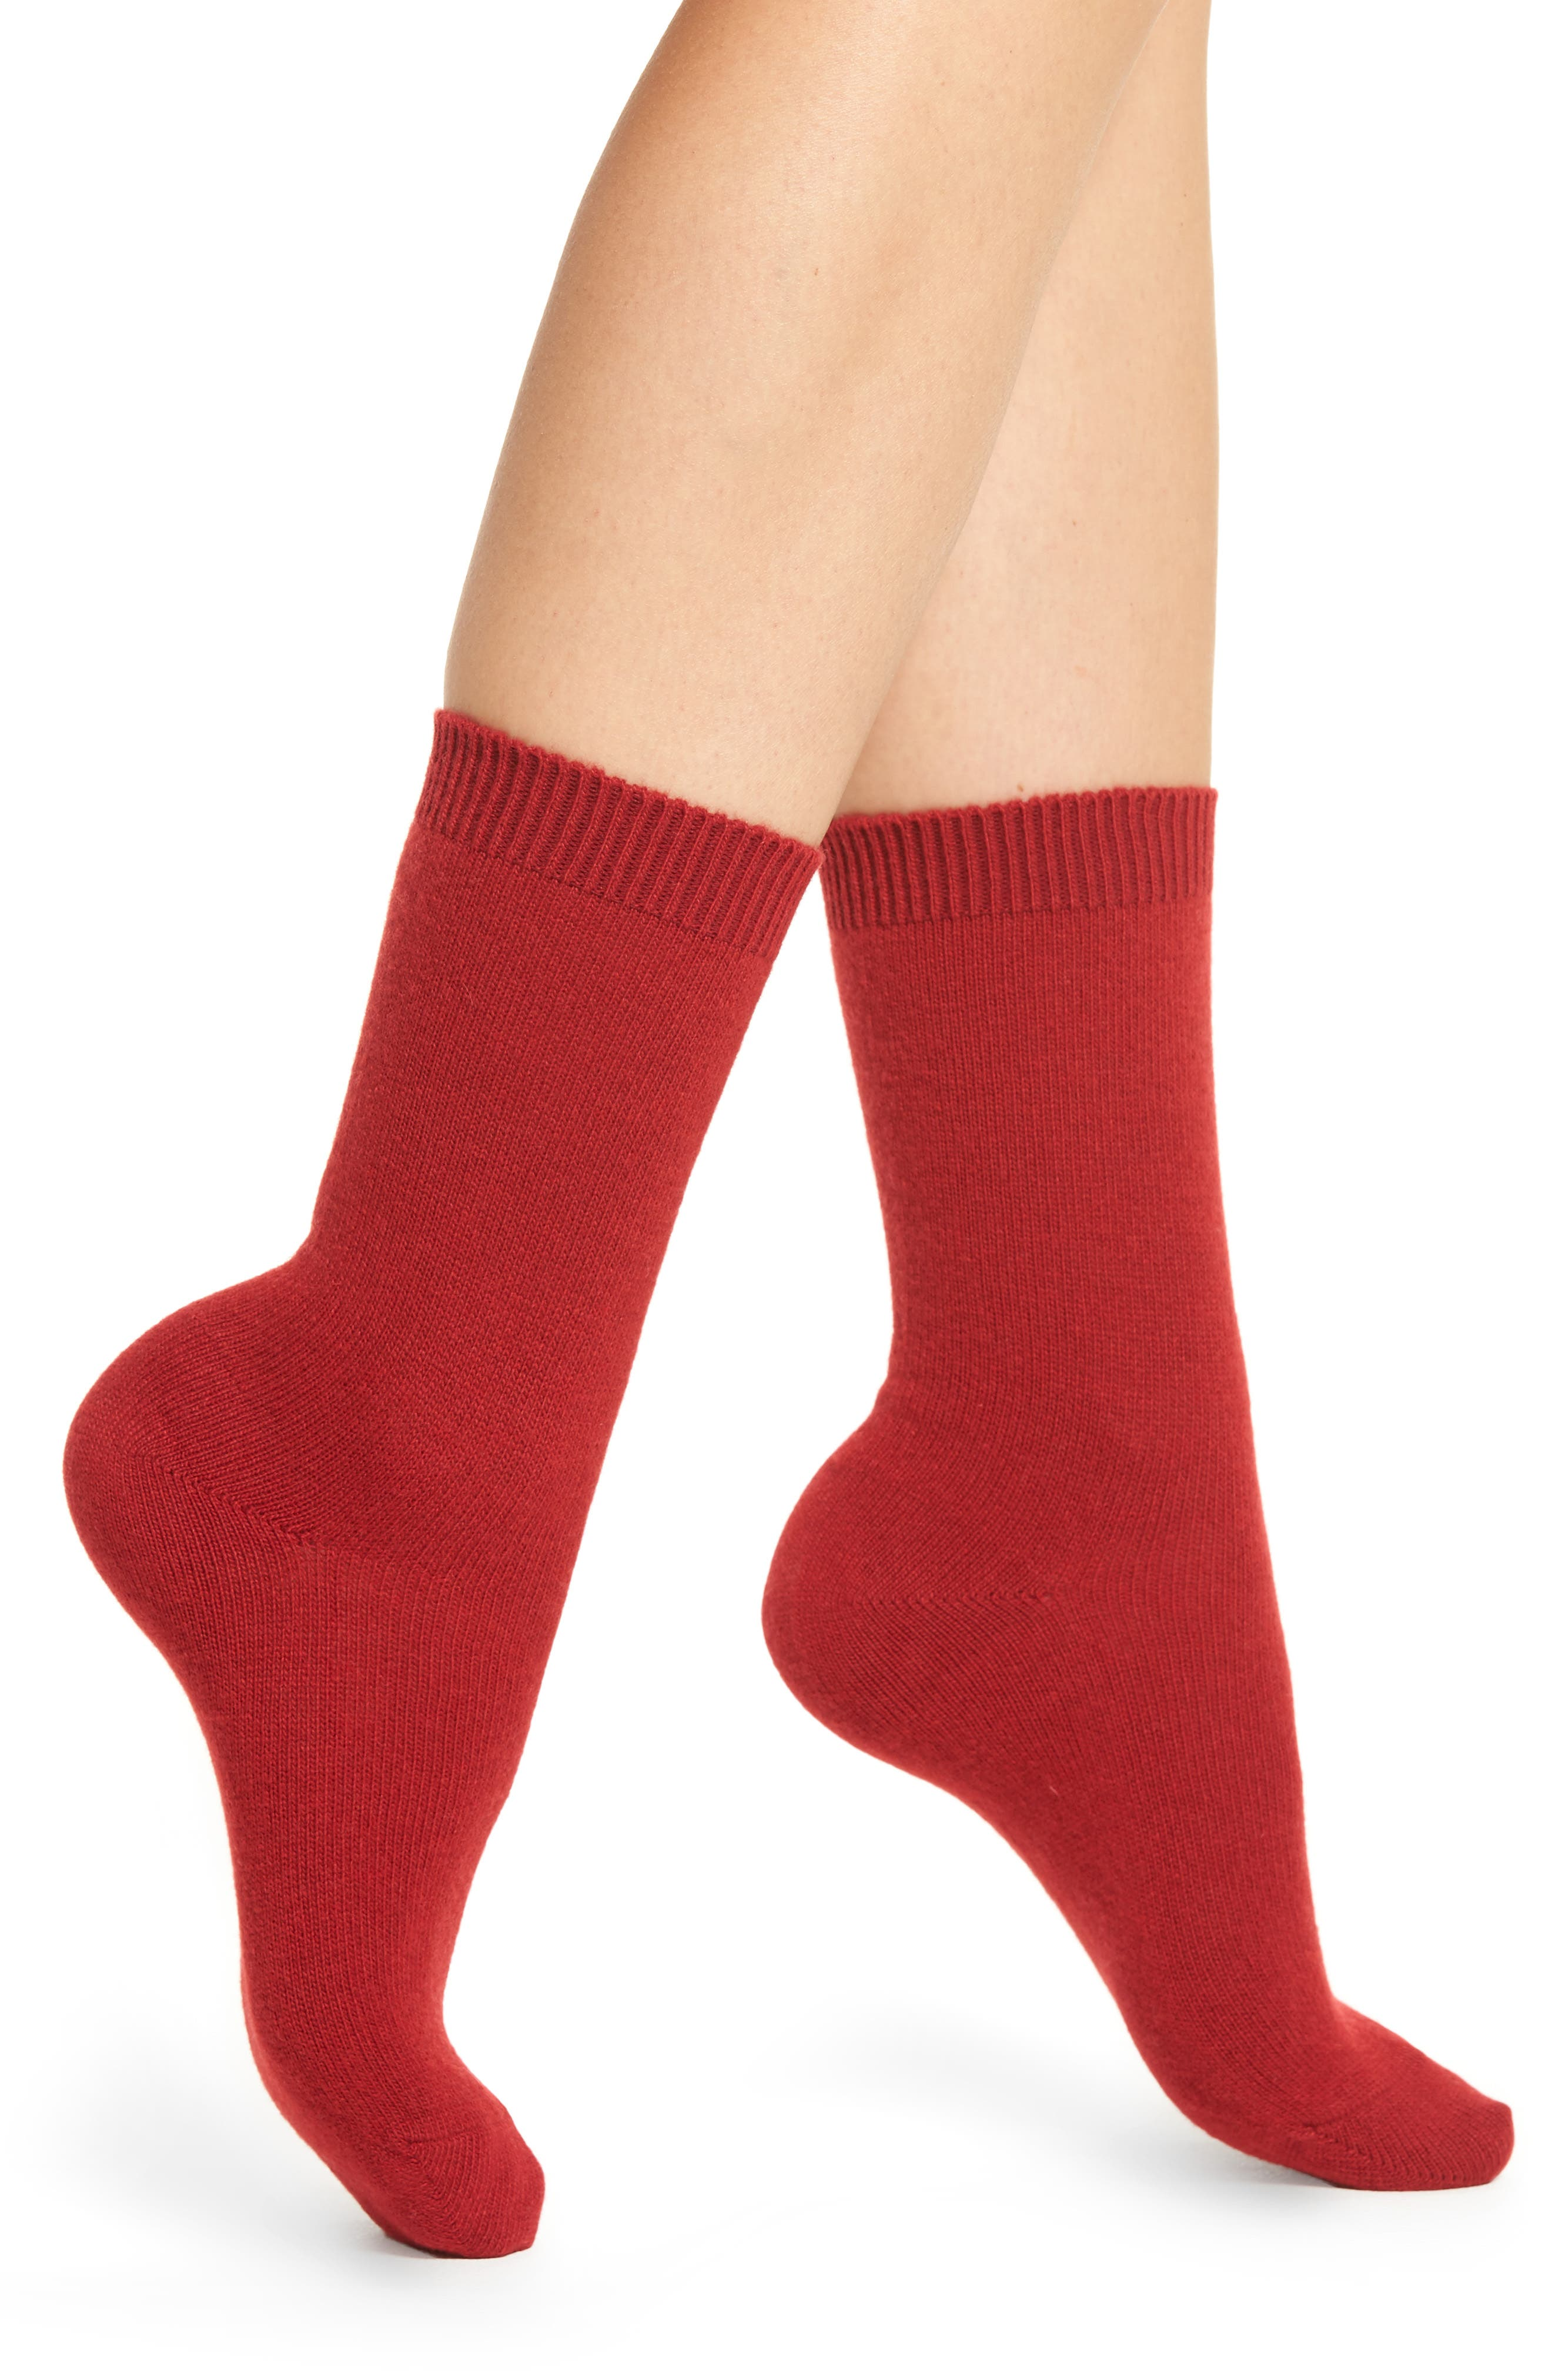 Cosy Crew Socks,                         Main,                         color, Ruby